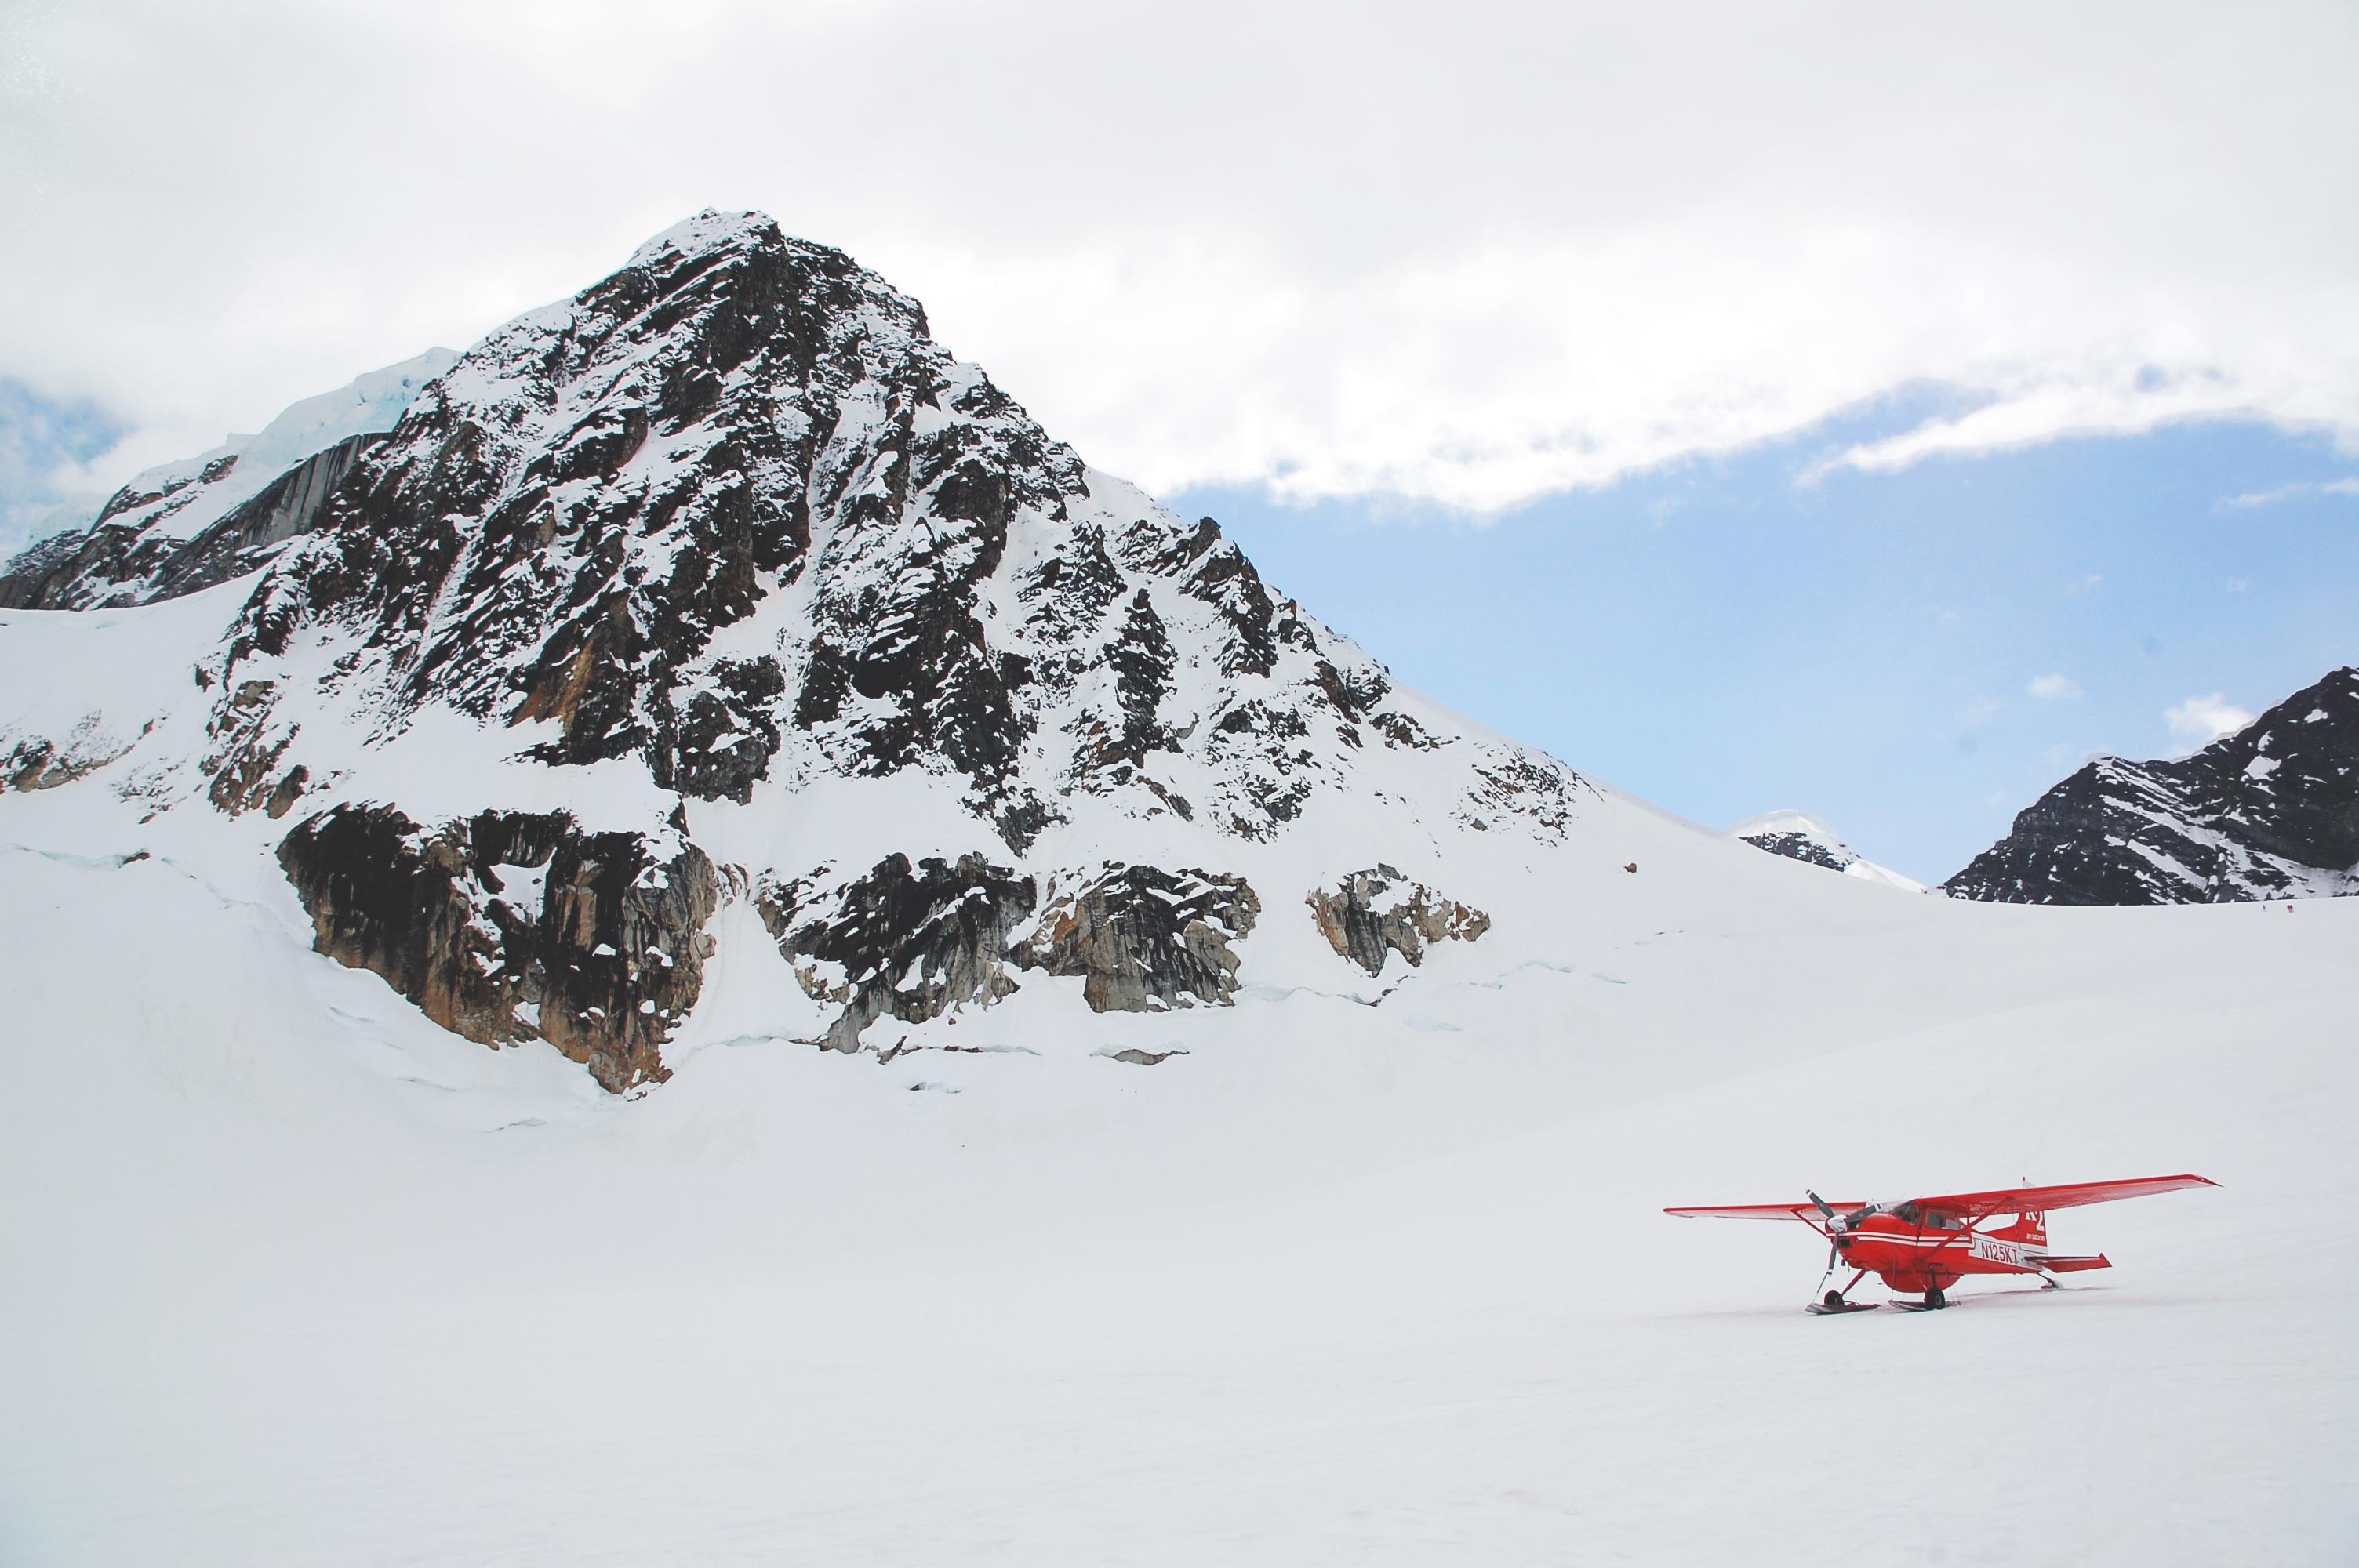 Plane, Ice, Mountain, Rock, Rocky, HQ Photo